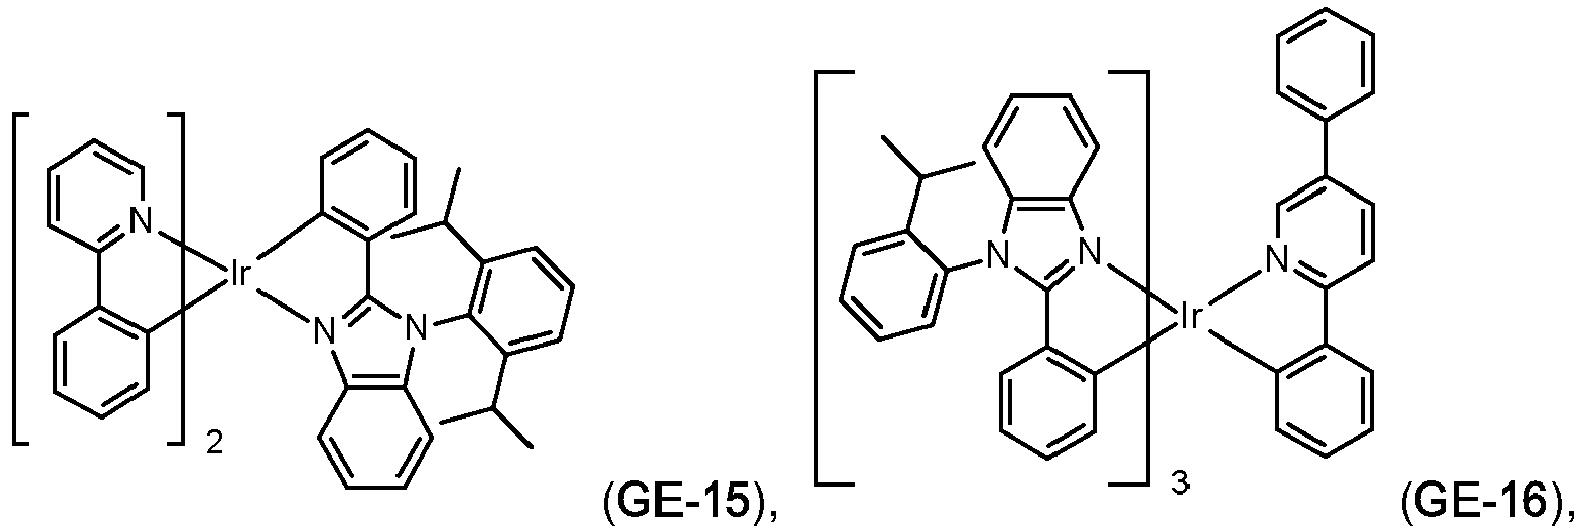 Figure imgb0815